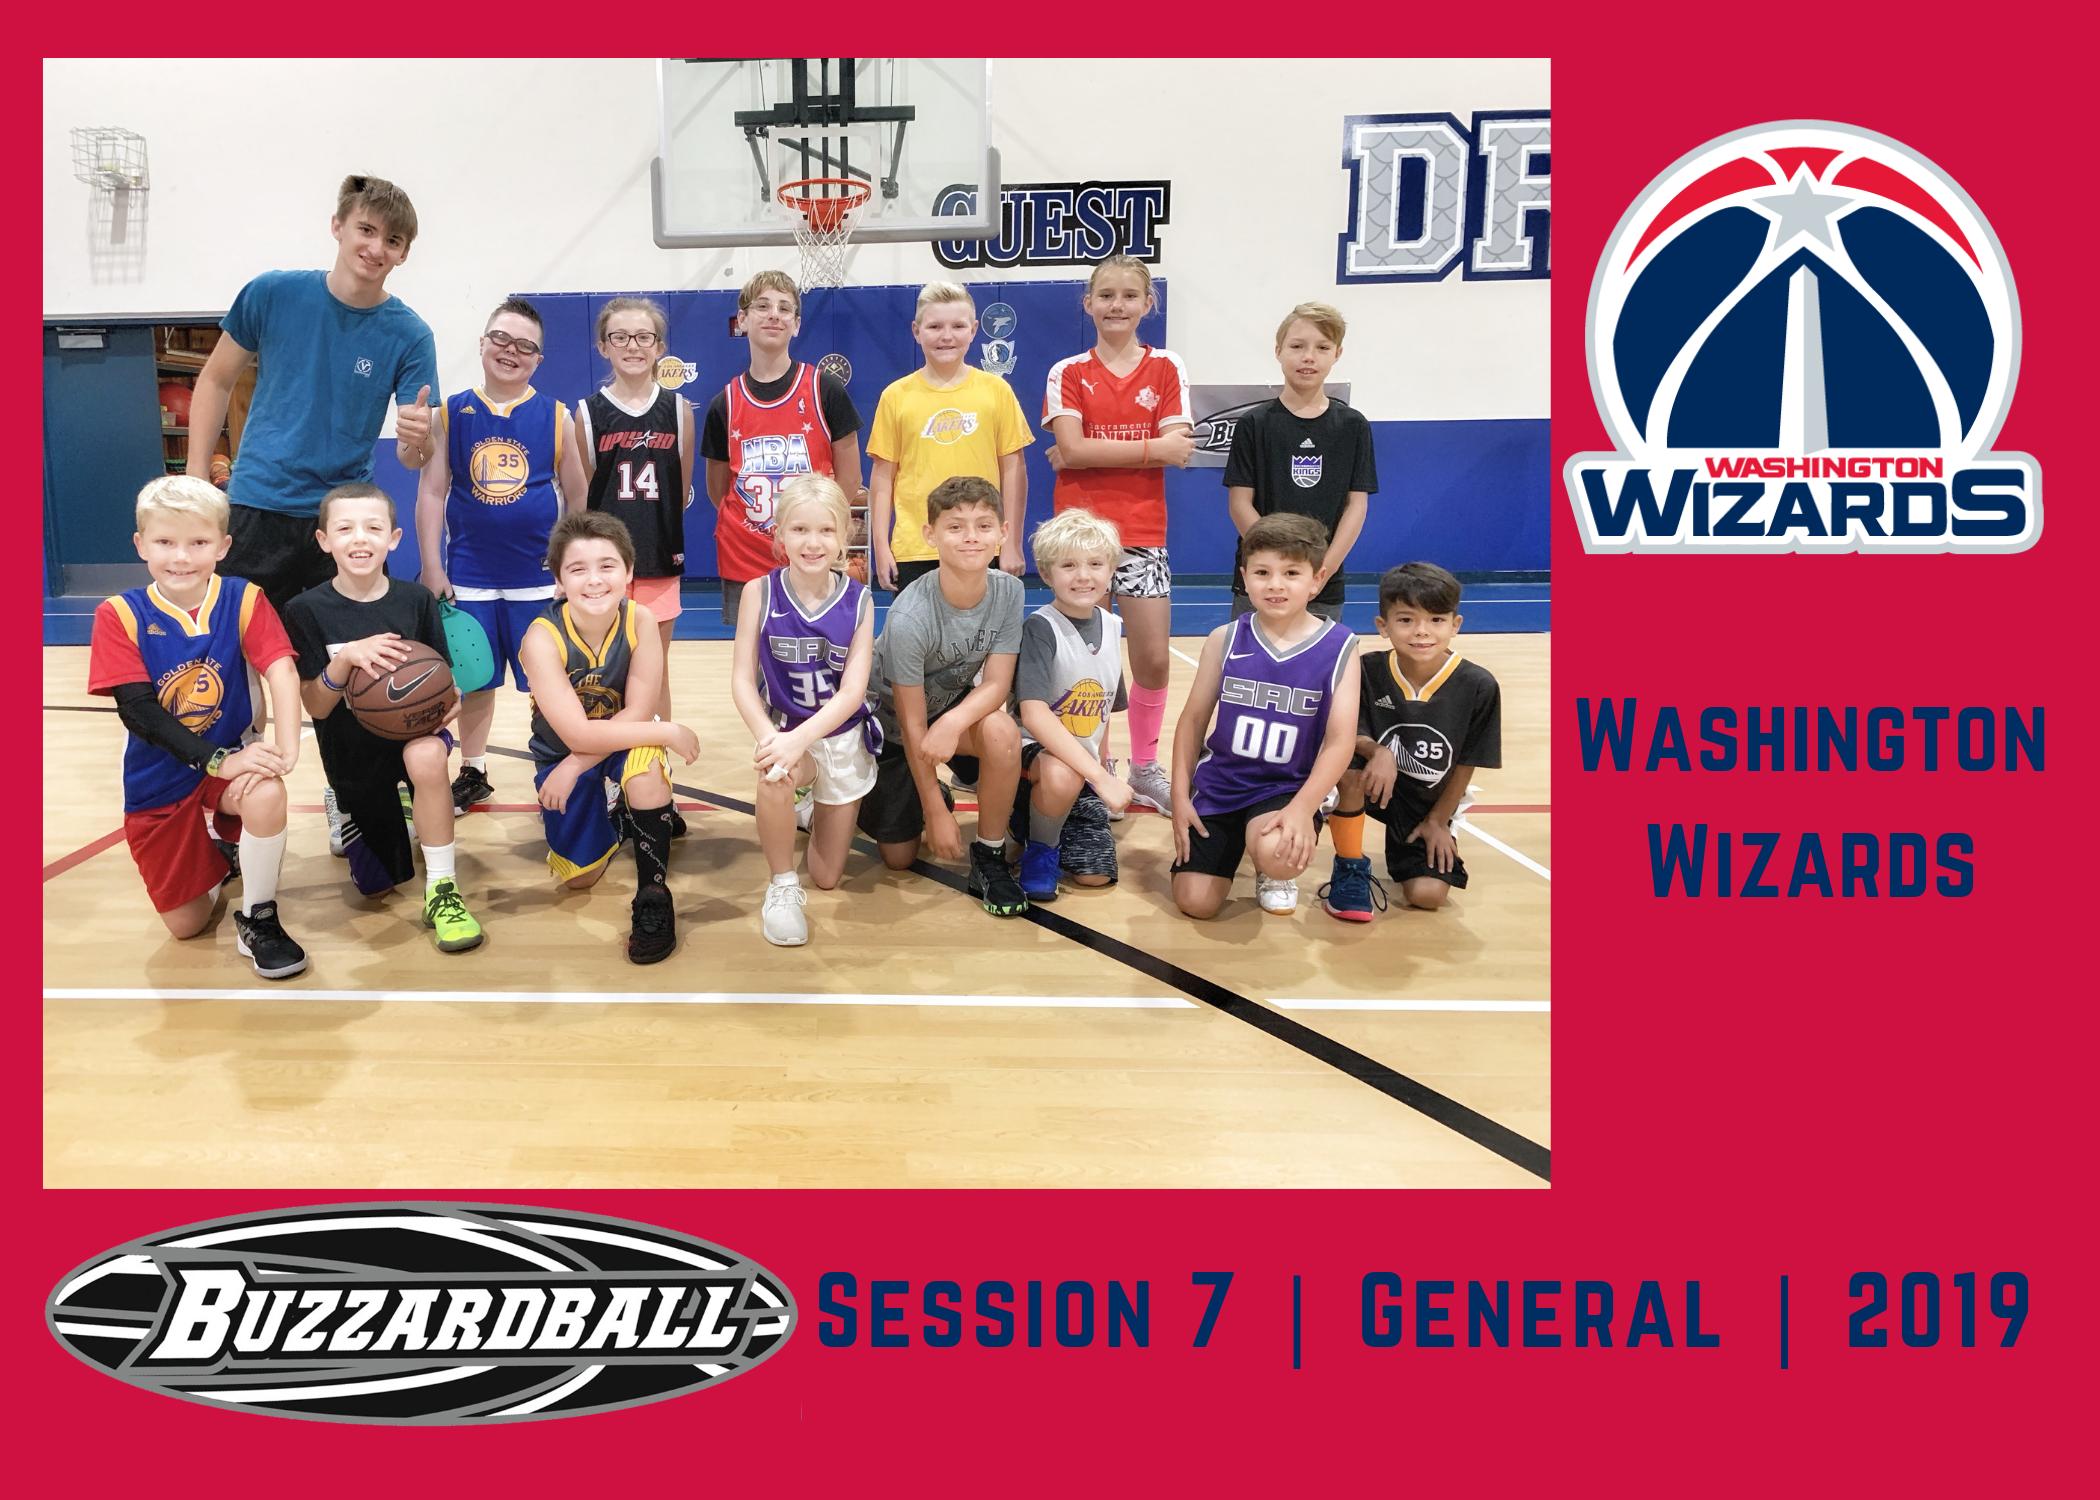 7 Washington Wizards.png